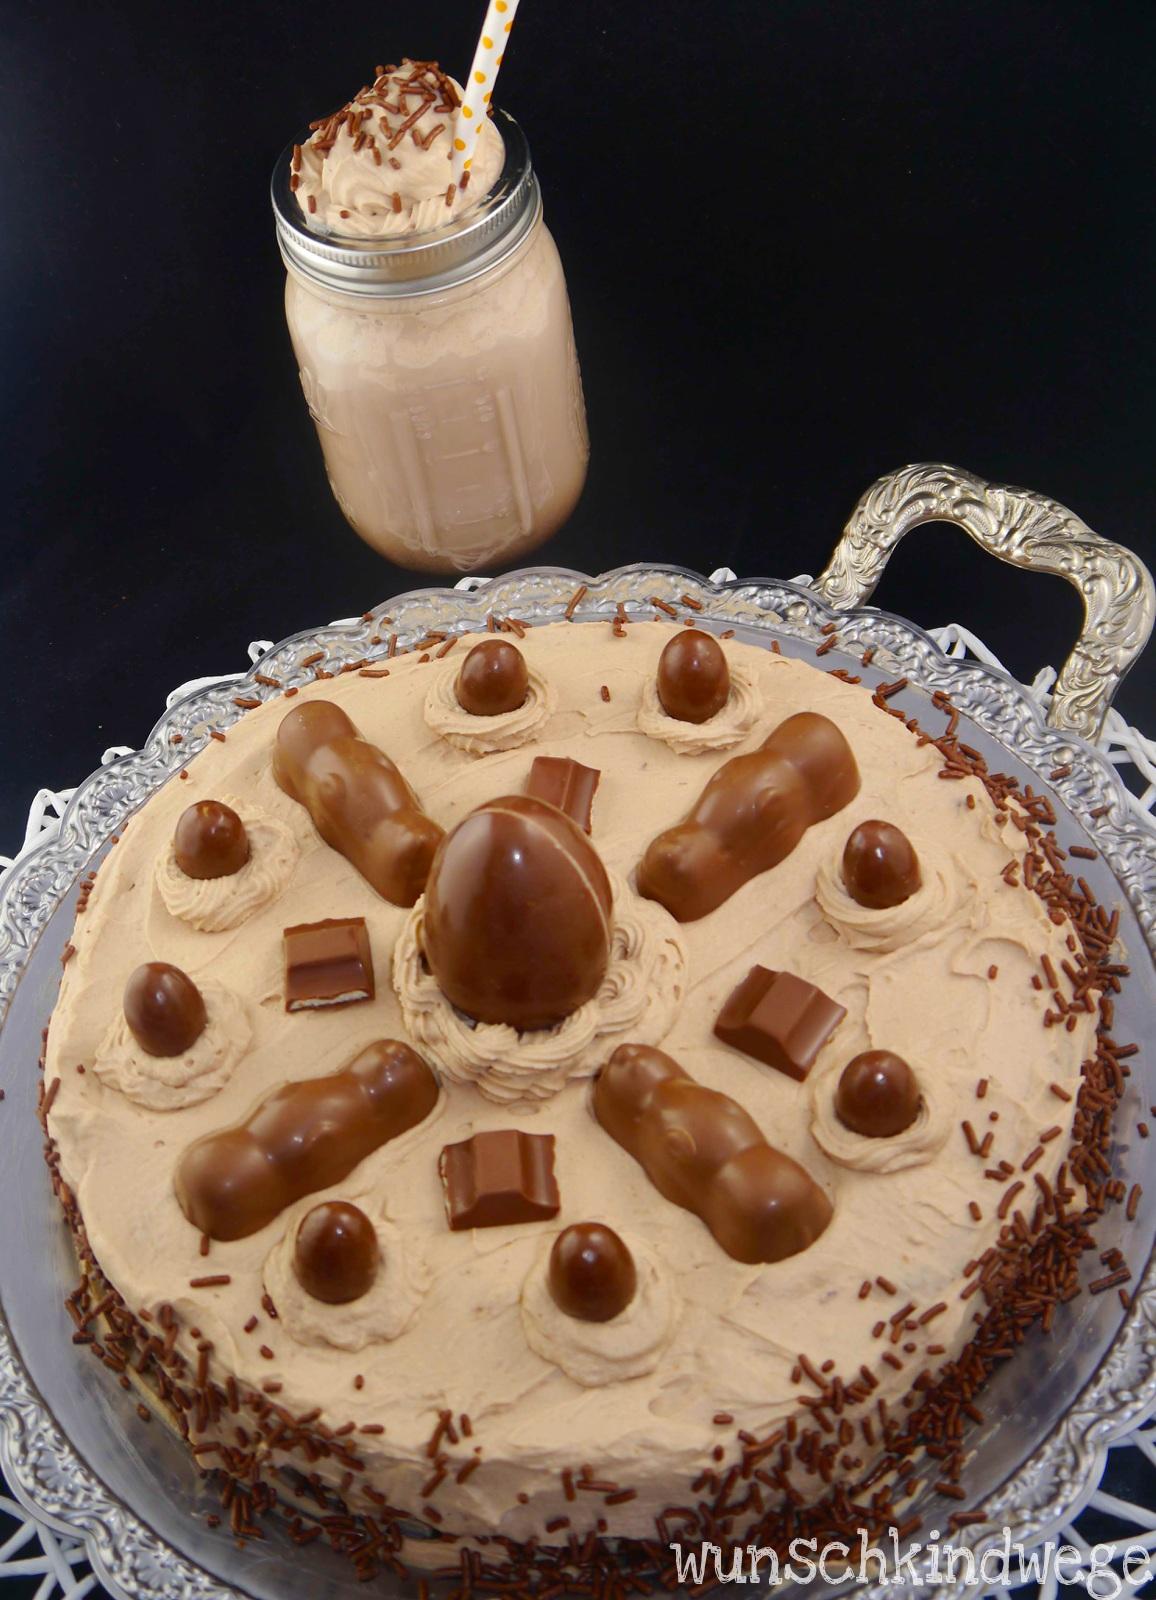 Diy Kinderschokoladen Torte Basteln Wunschkindwege